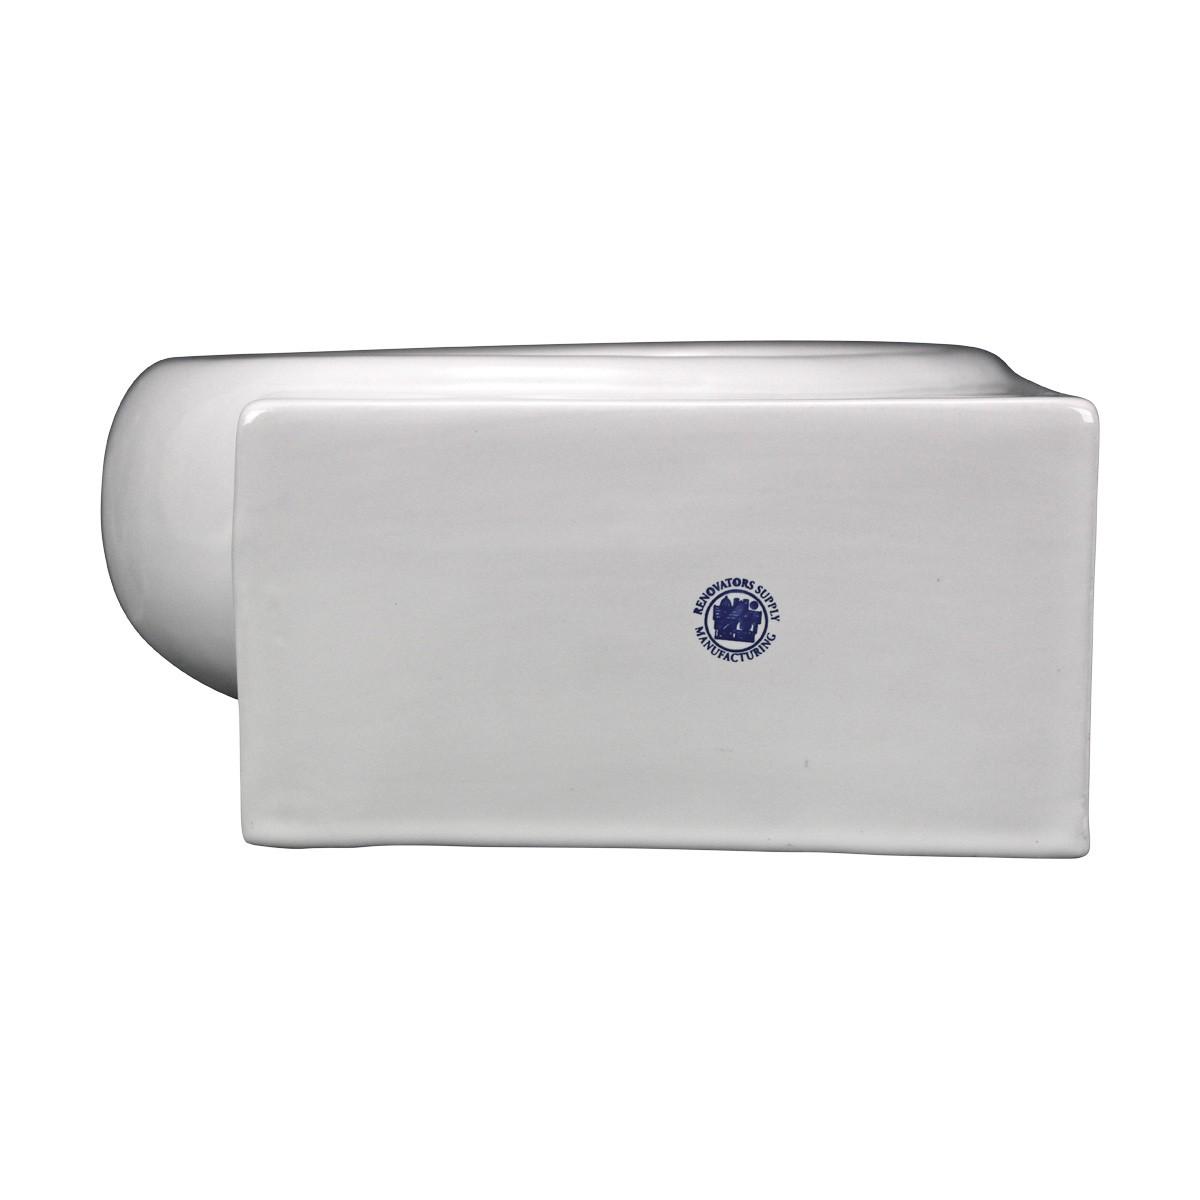 Corner Wall Mount Bathroom Sink Above Counter Vessel White bathroom vessel sinks Countertop vessel sink Vitreous China Bathroom Sinks